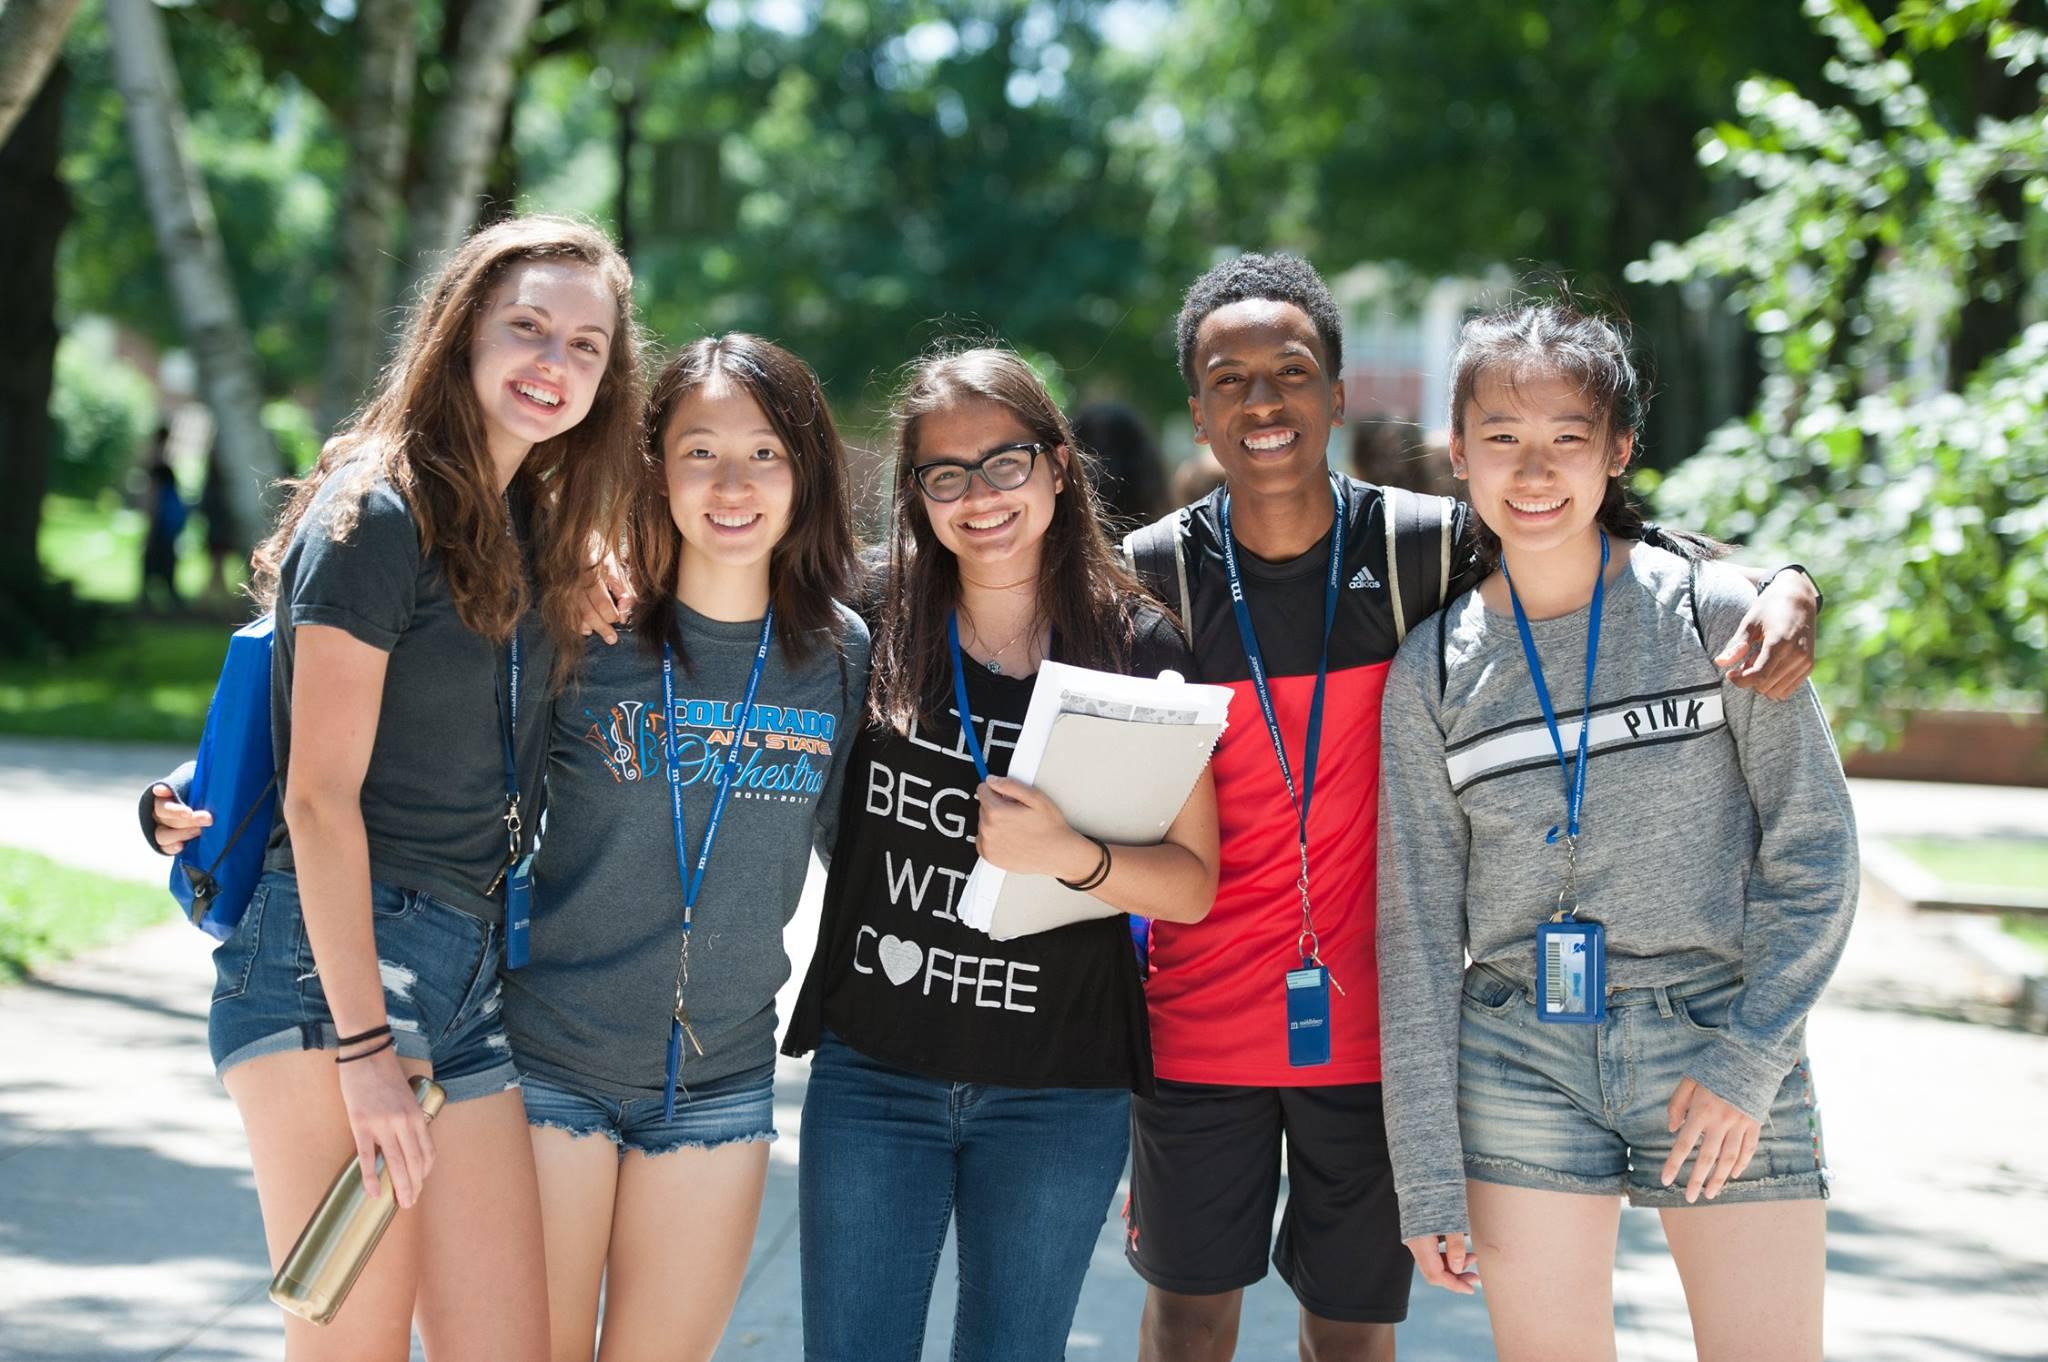 Summer Program - Spanish | U.S. Language Immersion for High School Students: Middlebury Interactive Language Academy